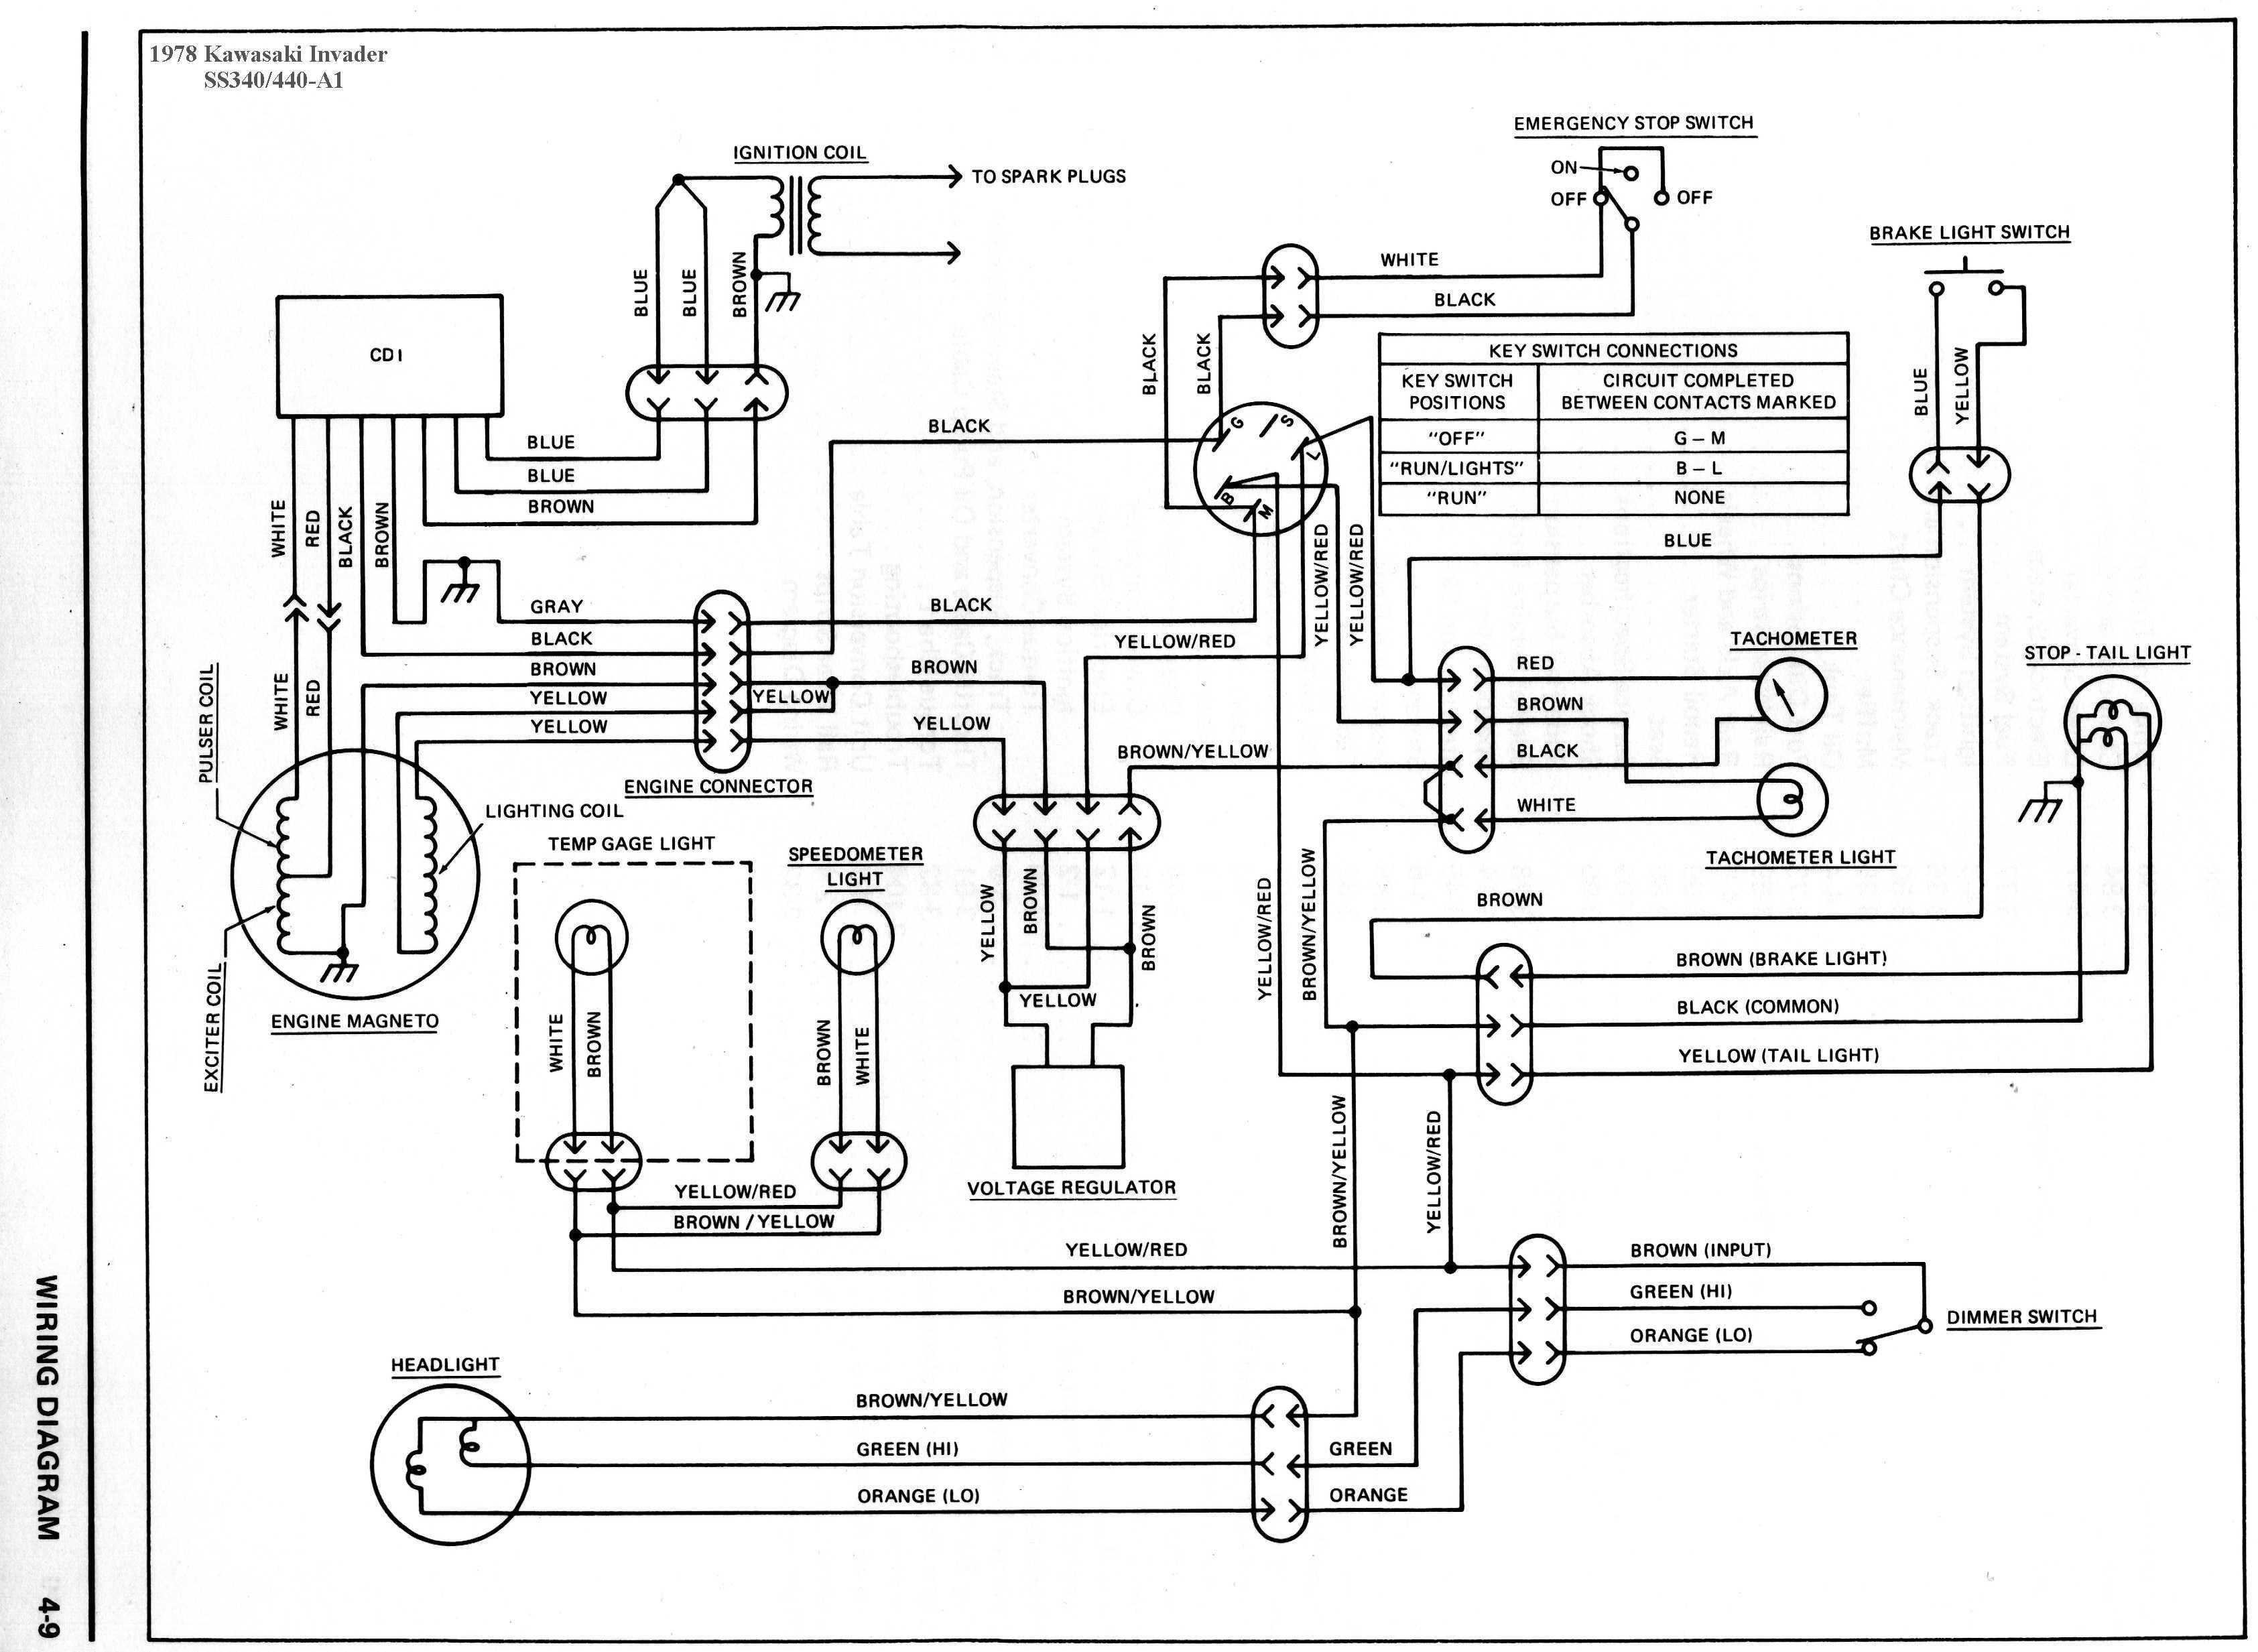 1975 Kawasaki Wiring Diagram - Wiring Diagrams Outlet on